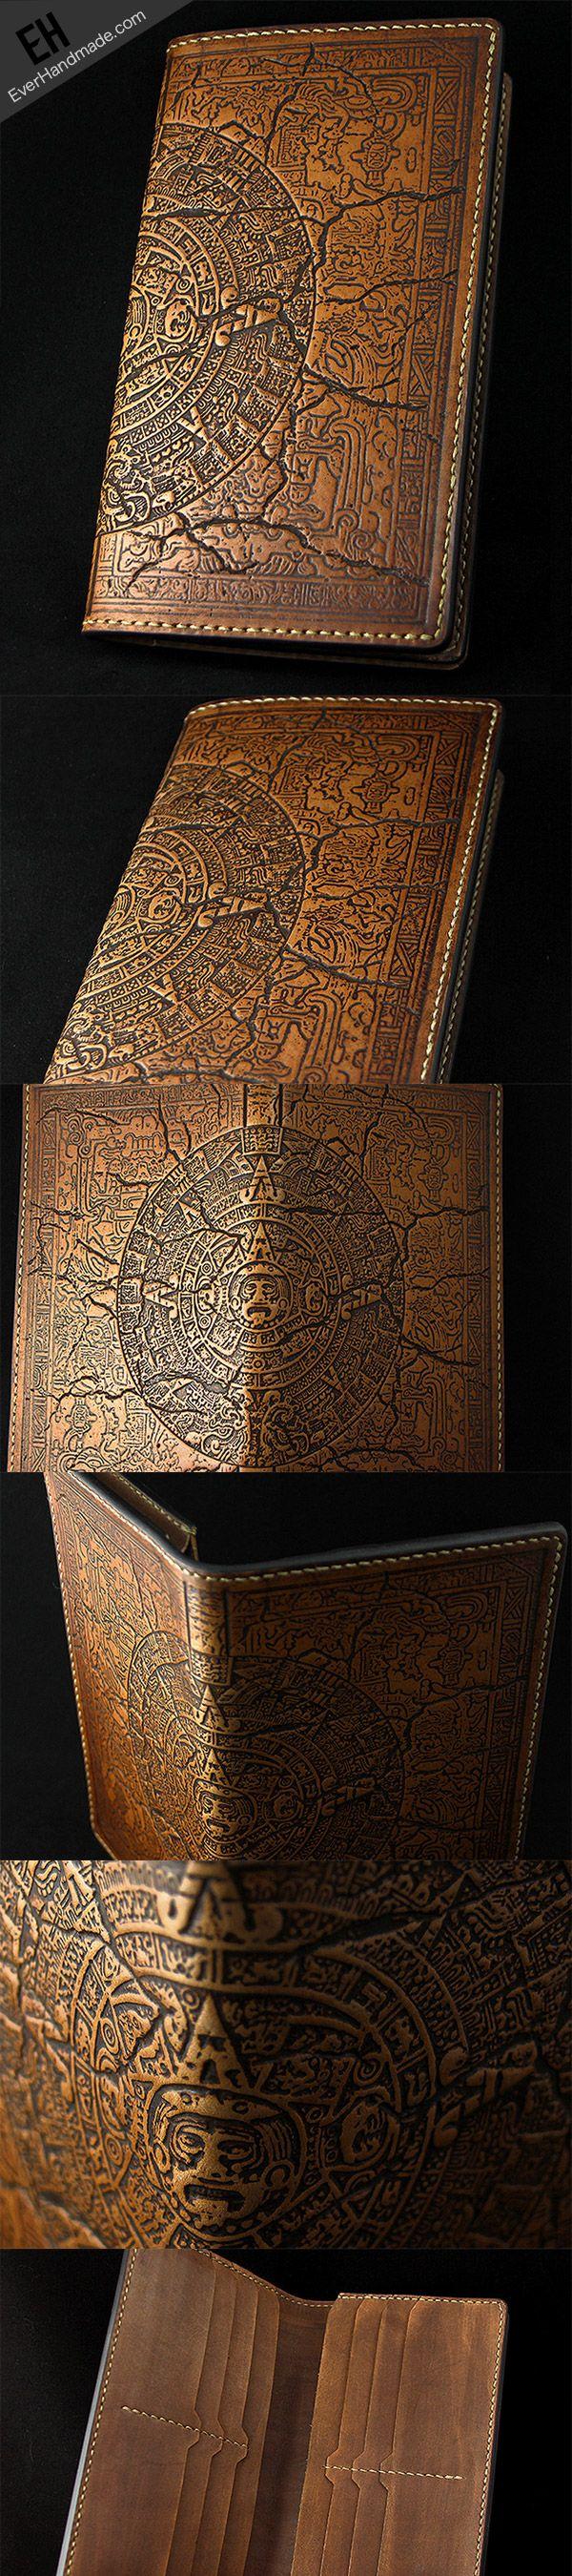 #mayan #maya Handmade leather Carved mayan solar long wallet for men So stunning!!!!!!!!!!